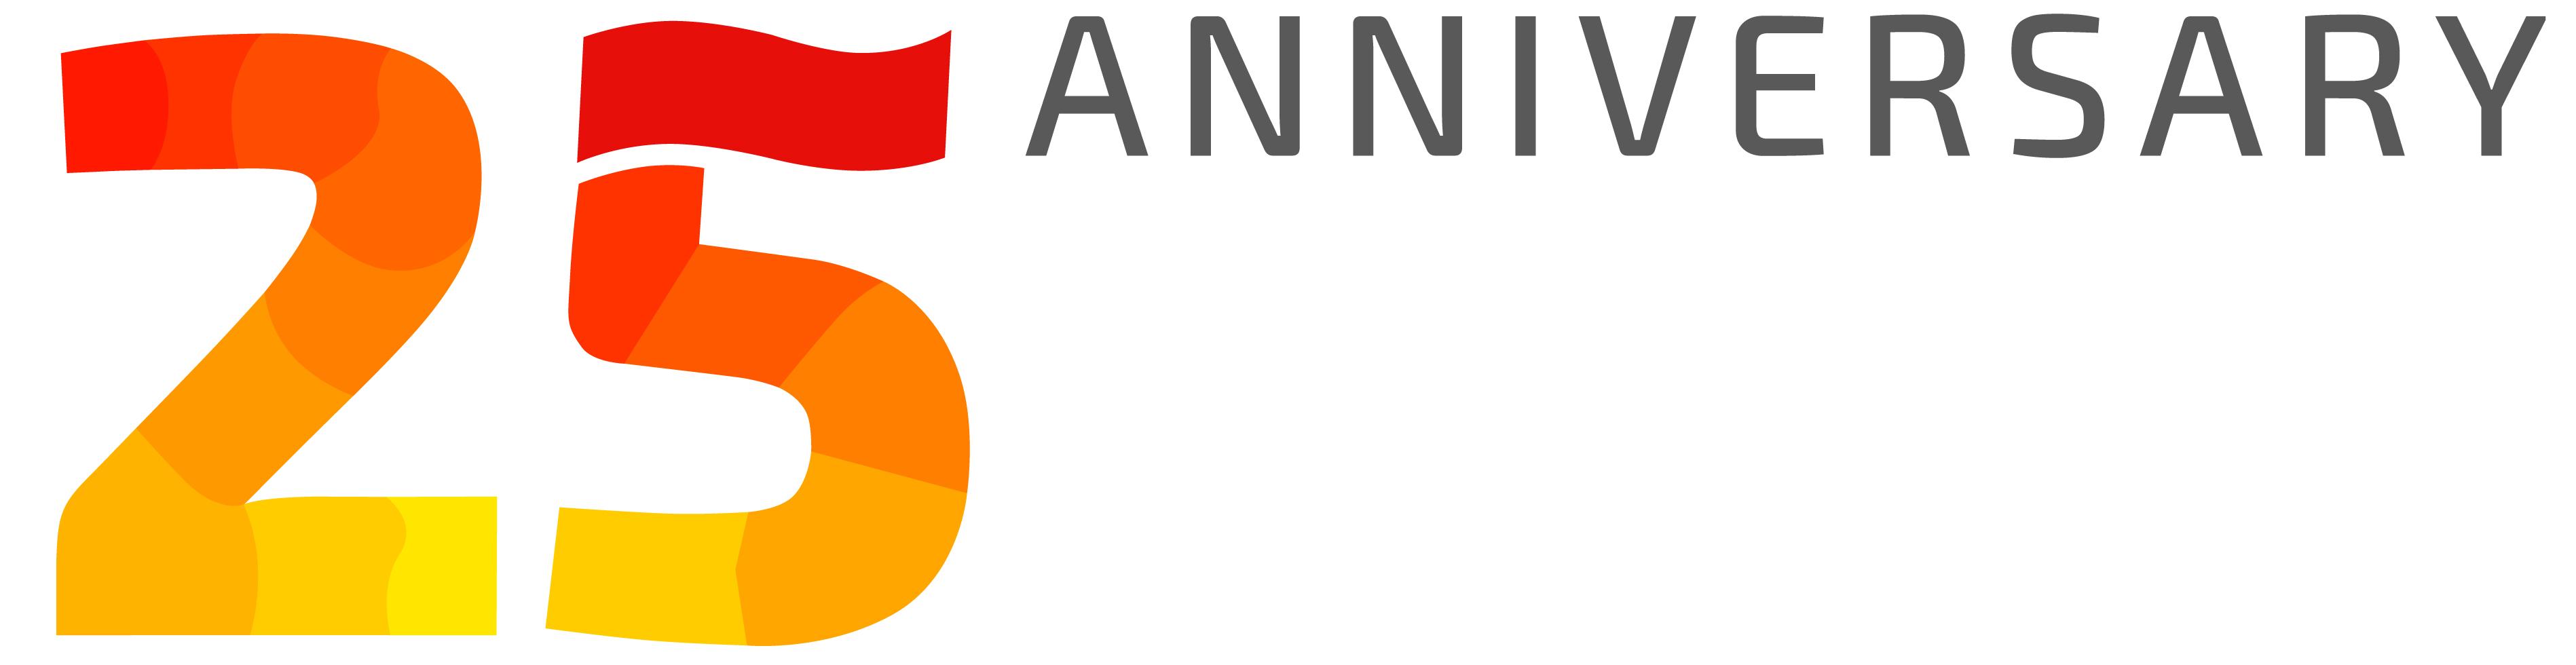 Wir feiern  25 Jahre!